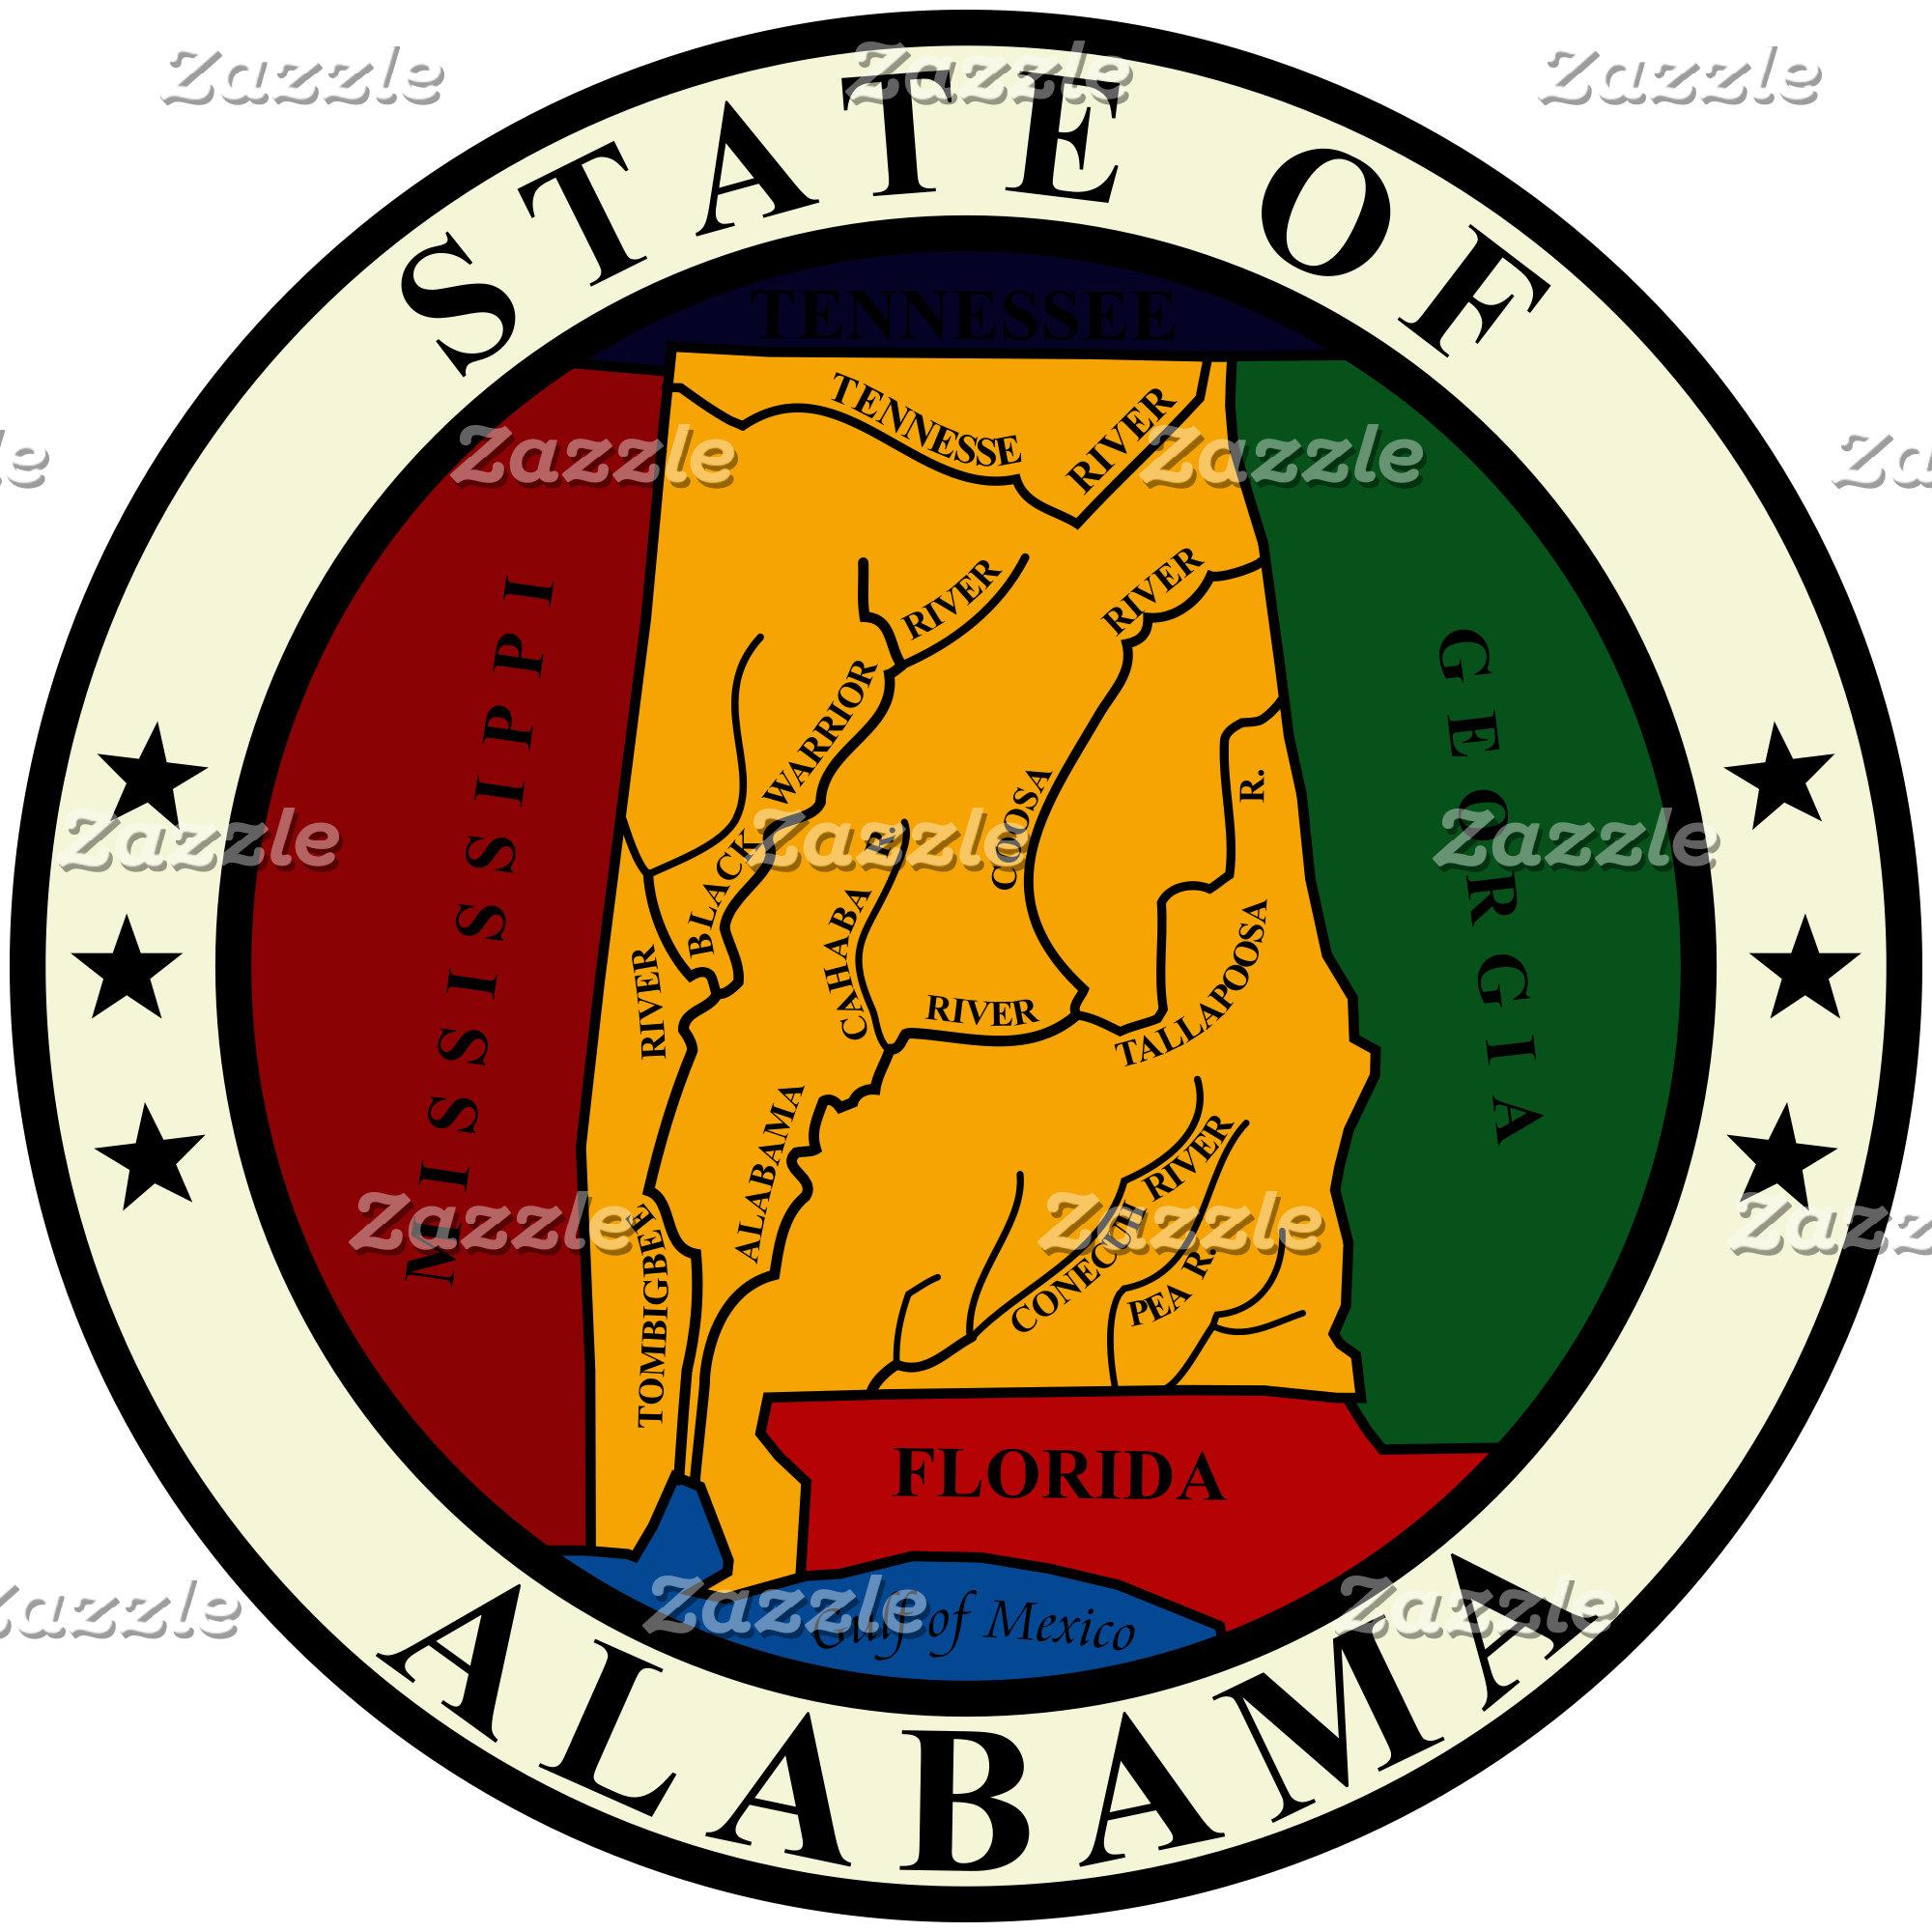 ALABAMA-THE YELLOWHAMMER STATE